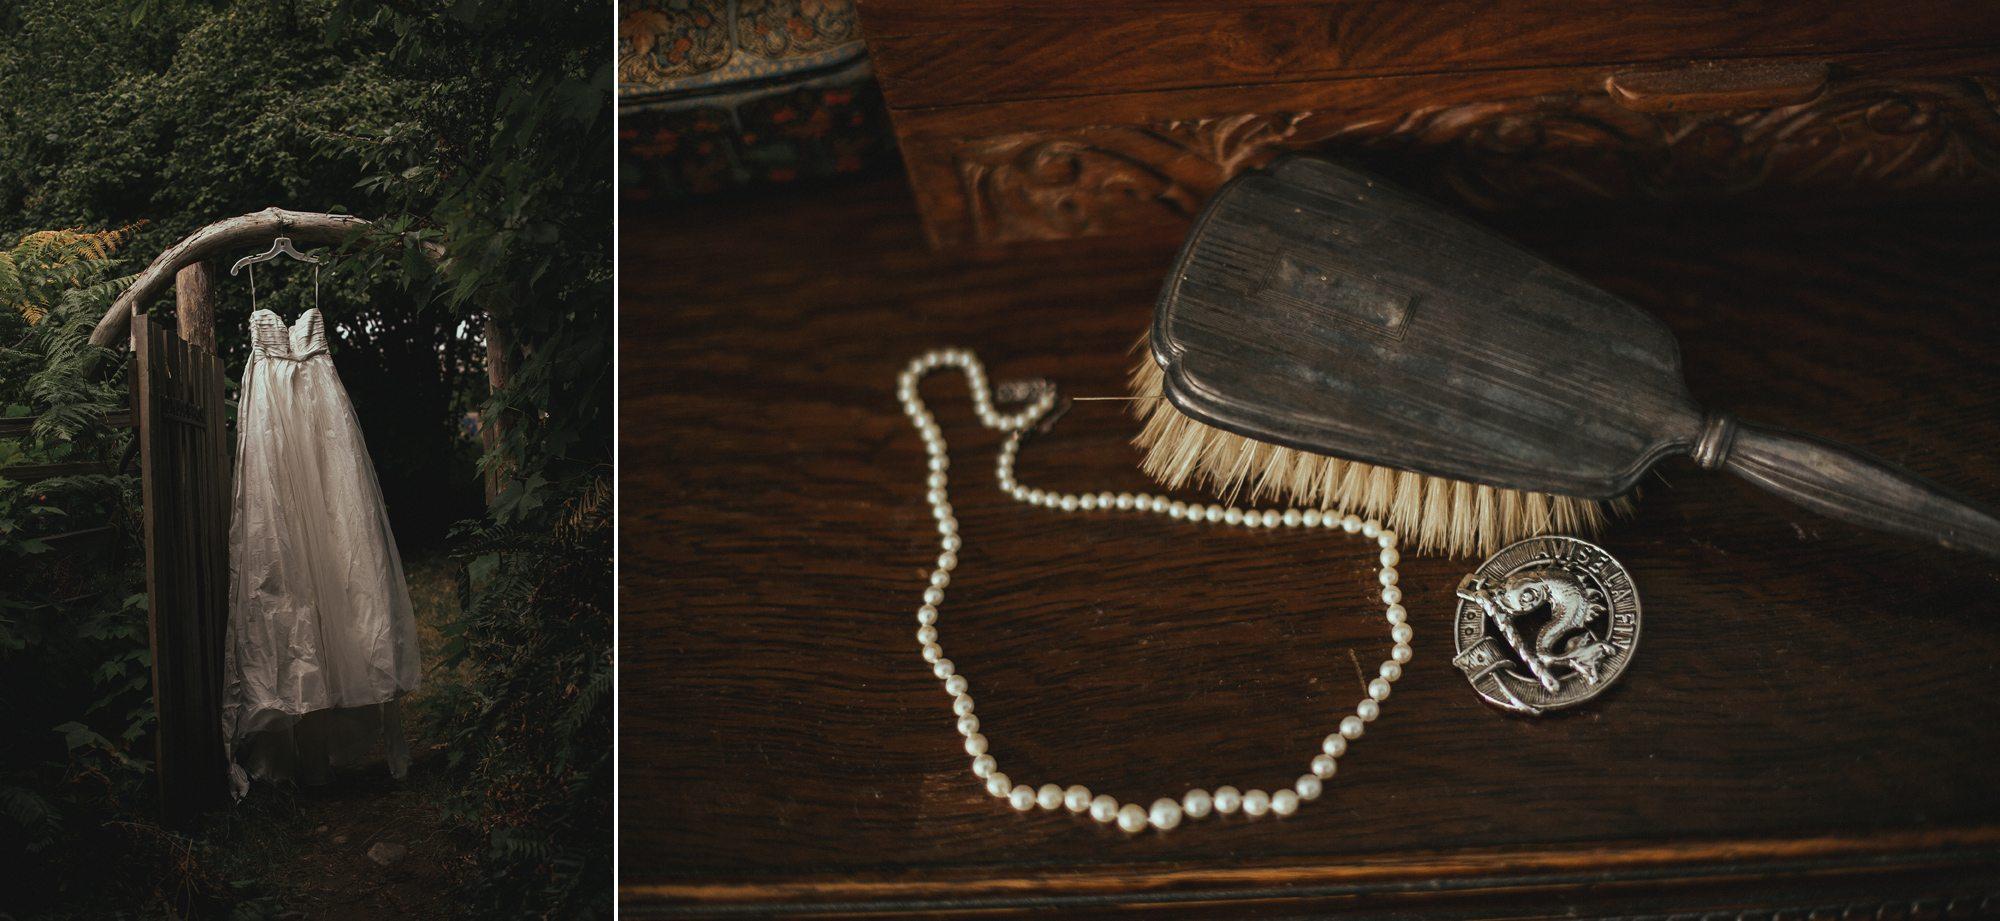 Robert + Devon  //  Gibsons Wedding Photographer, Luke Liable  // Victoria & Vancouver Island Wedding Photographer